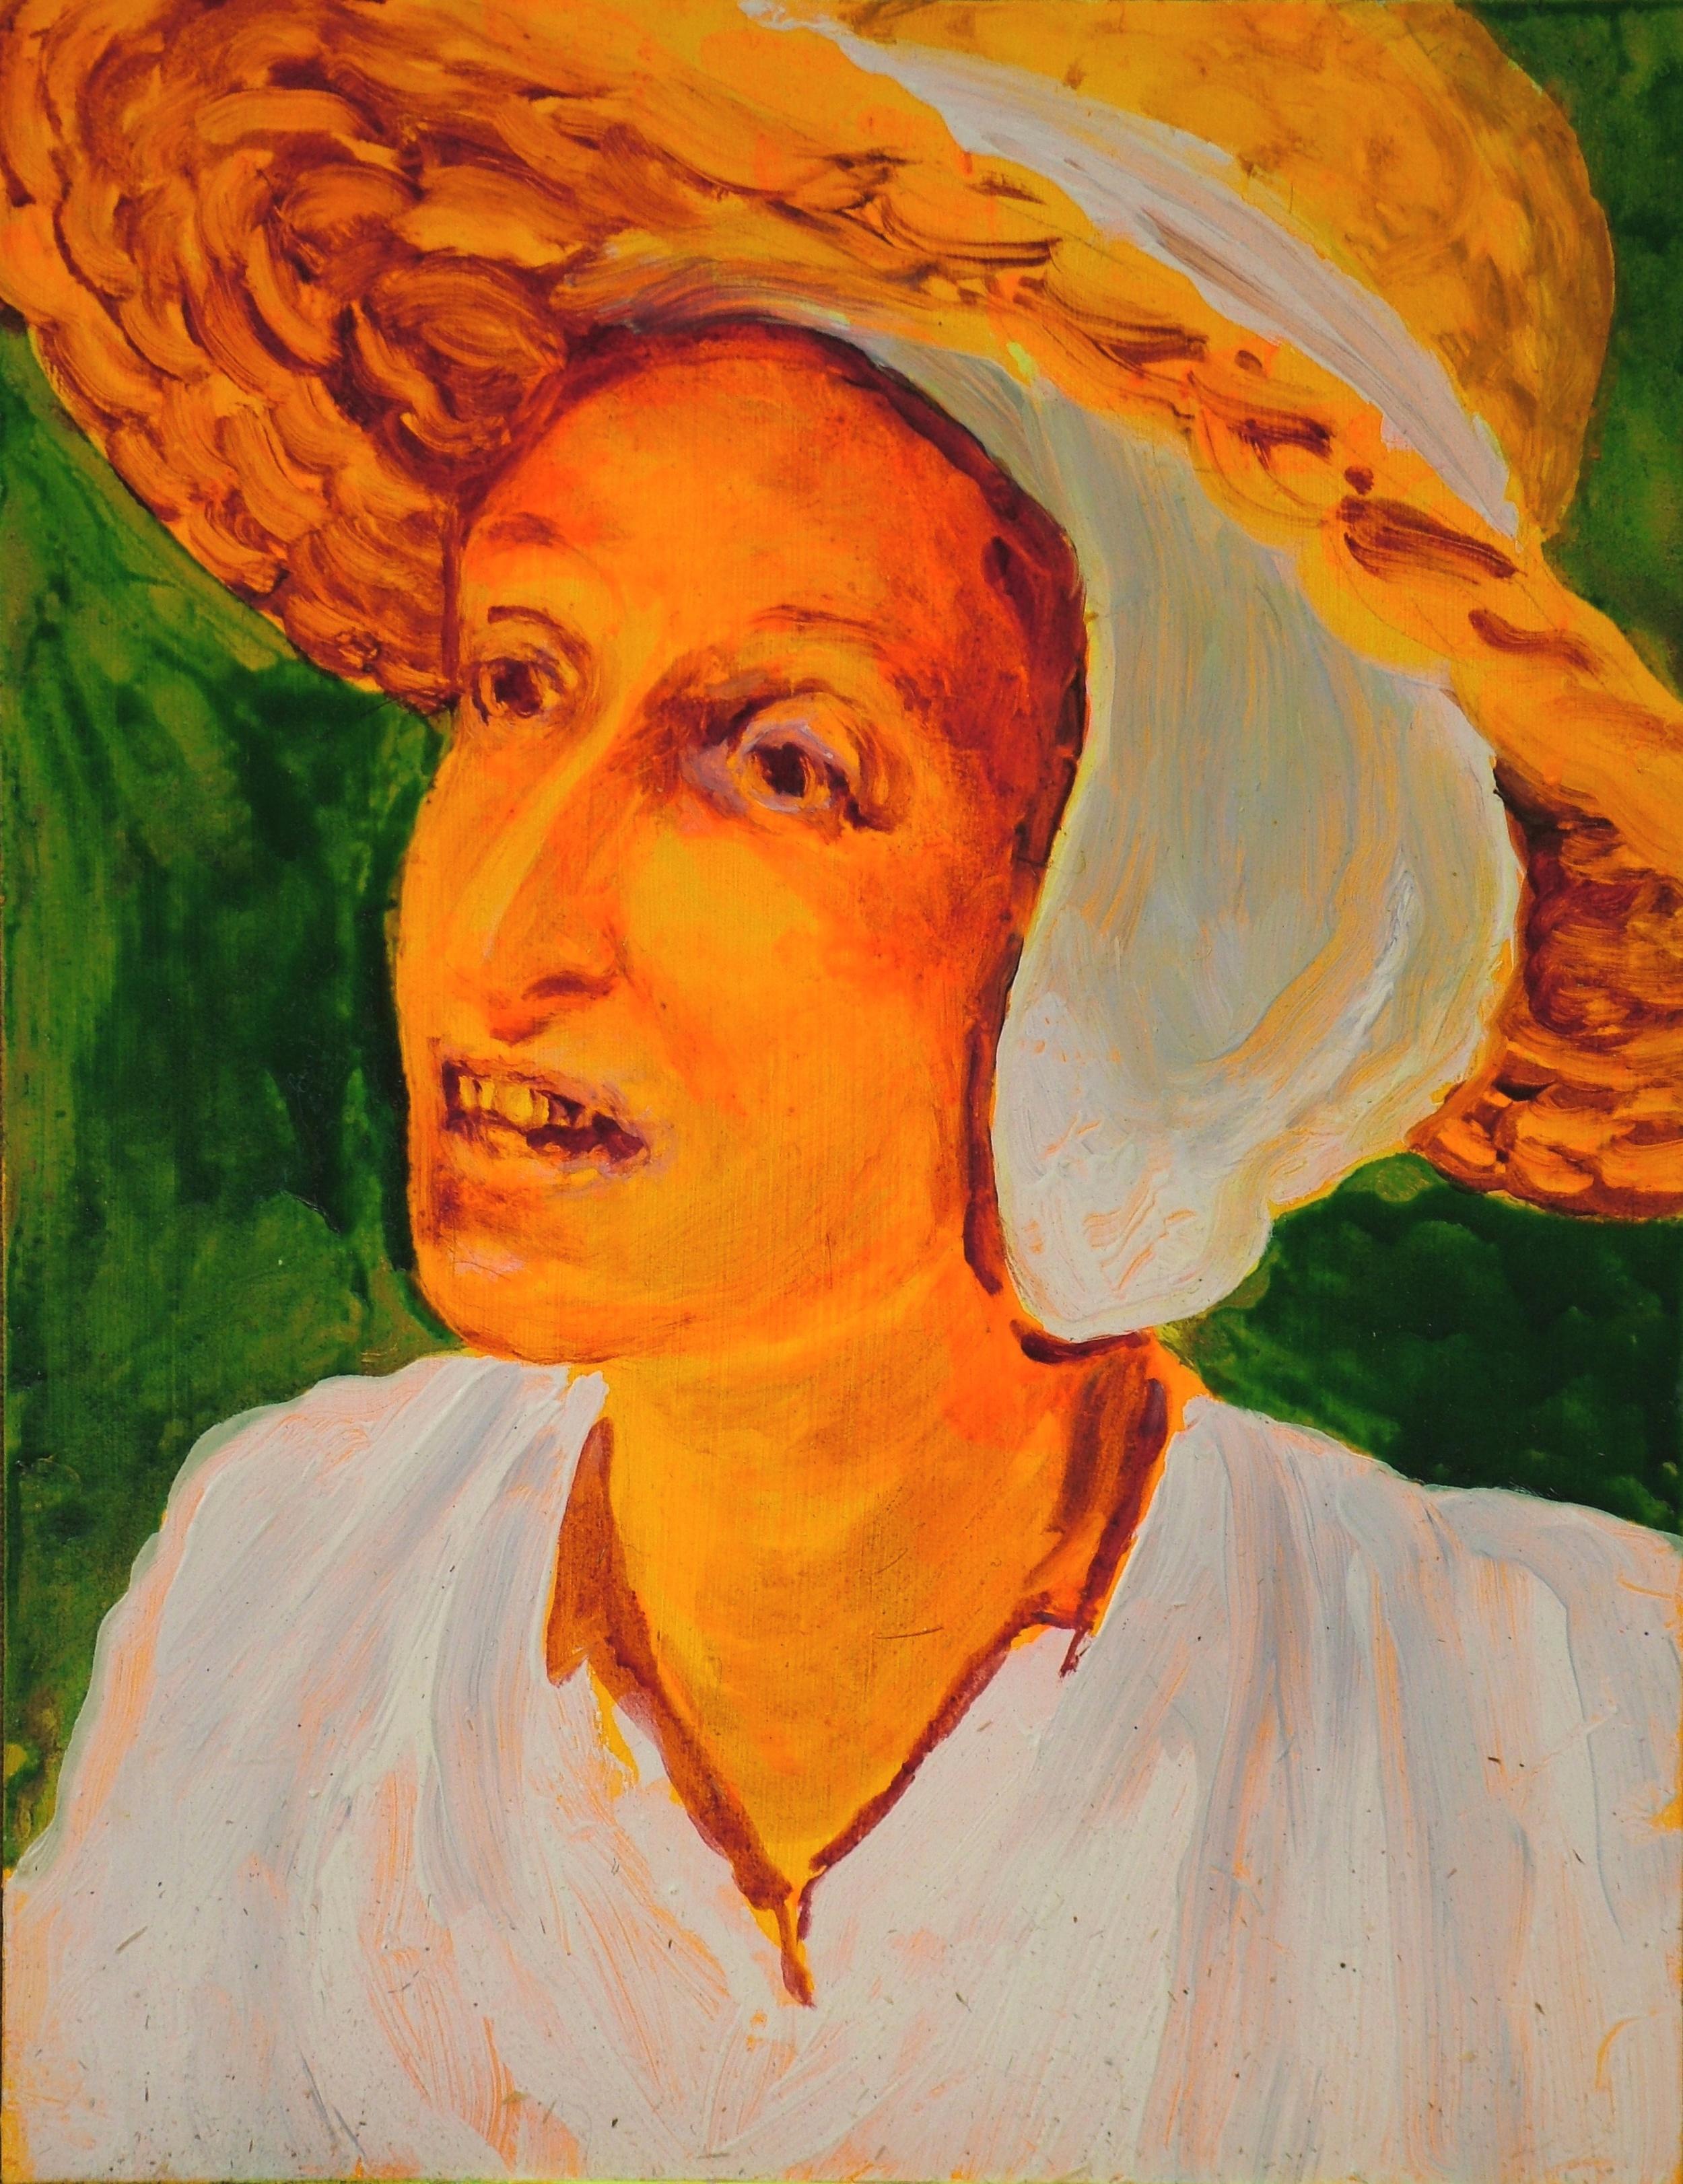 A Peasant Woman, 2006